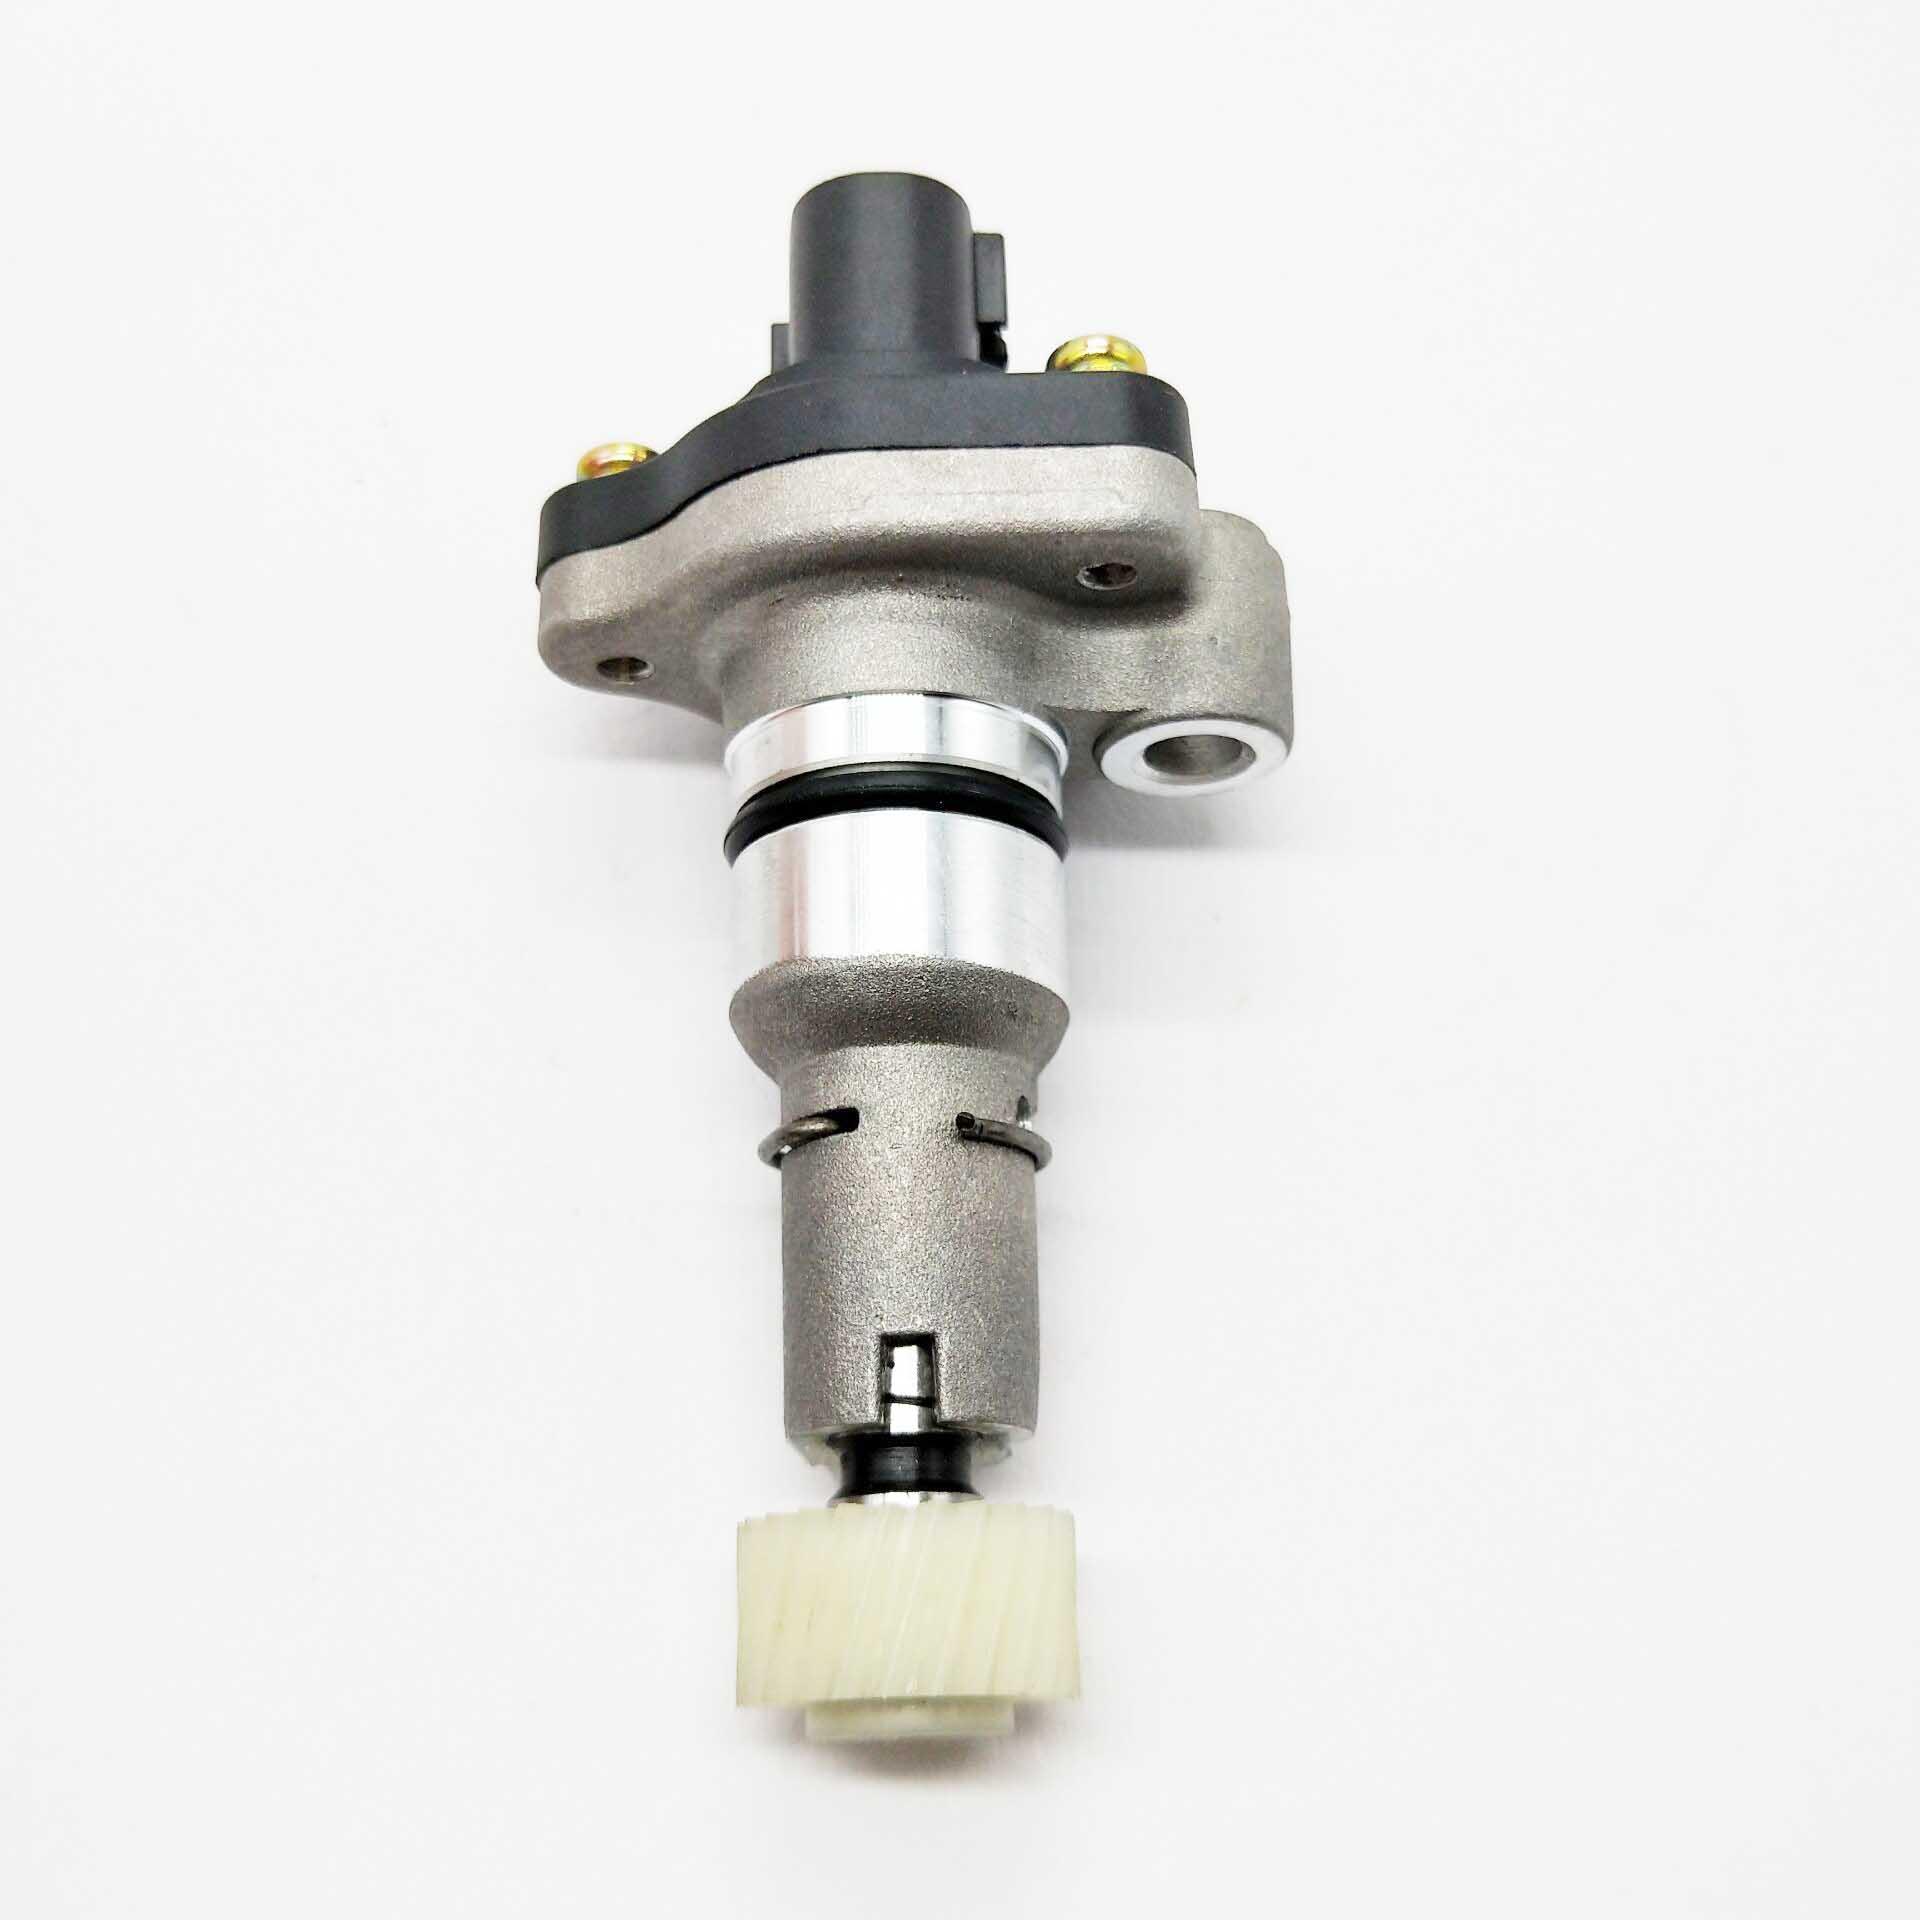 SMD Speed Sensor 8318112060 83181 12060 voor Toyota RAV 4 1994-2000 Toyota MR2 1991-1995 OE #83181-12060